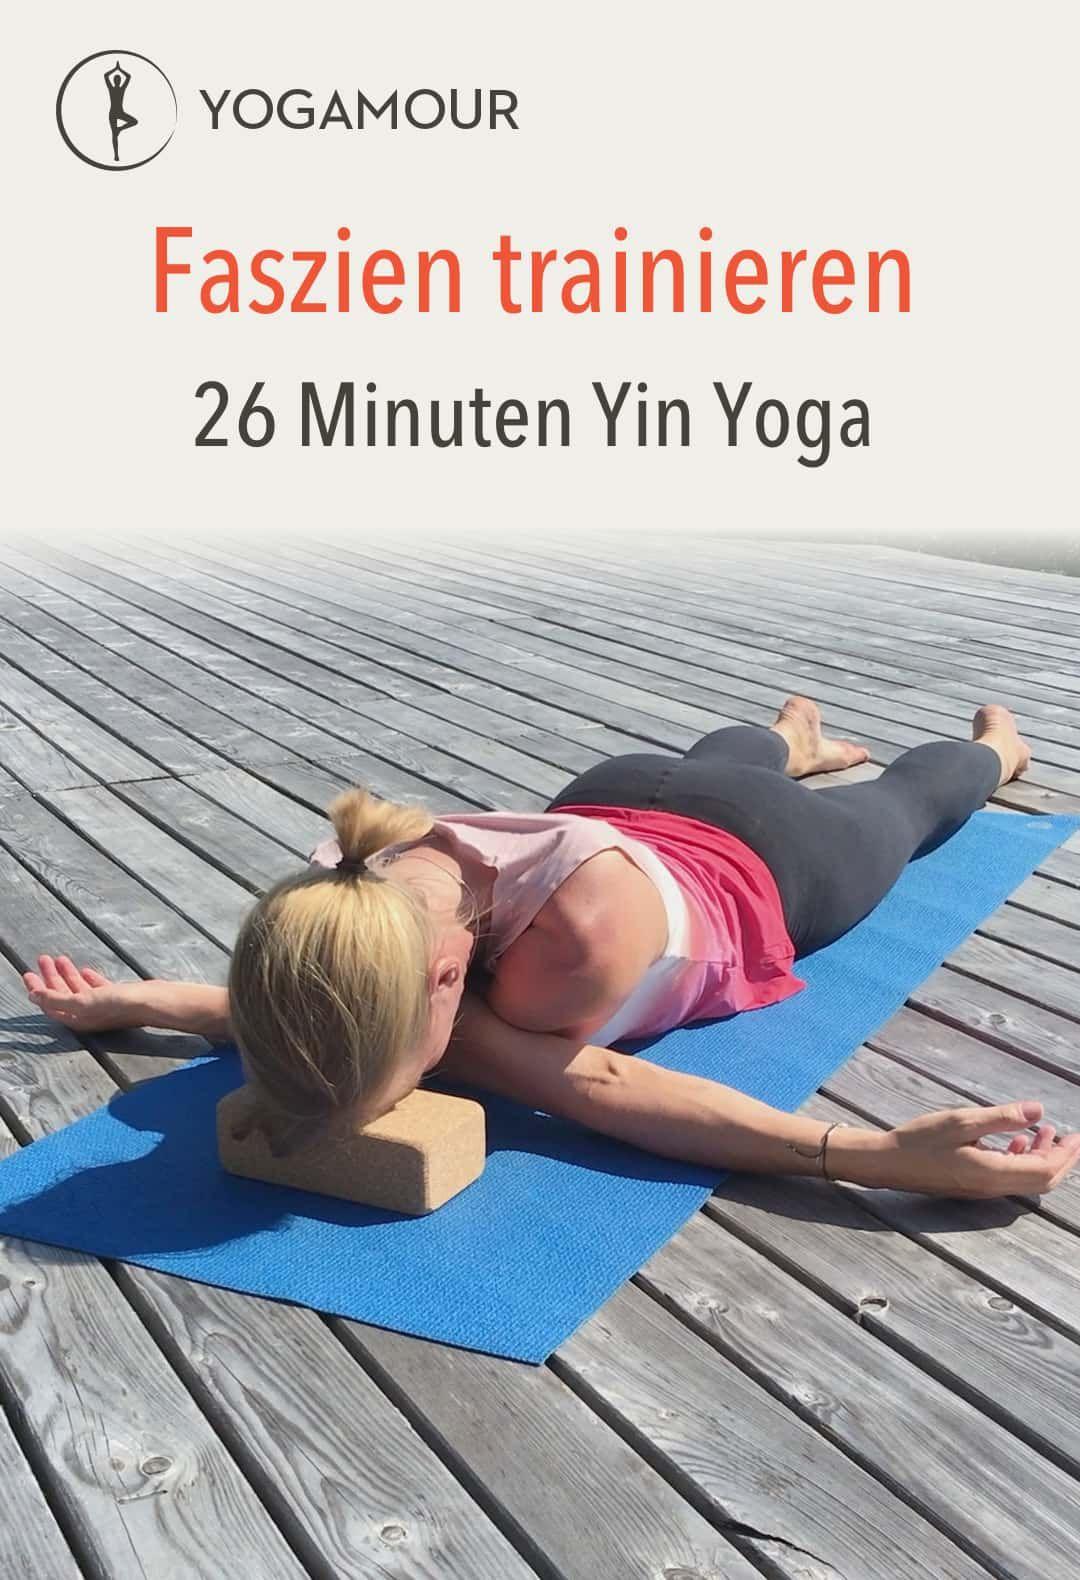 Yin Yoga Nacken Schulter Nackenschmerzen #pilatesyoga